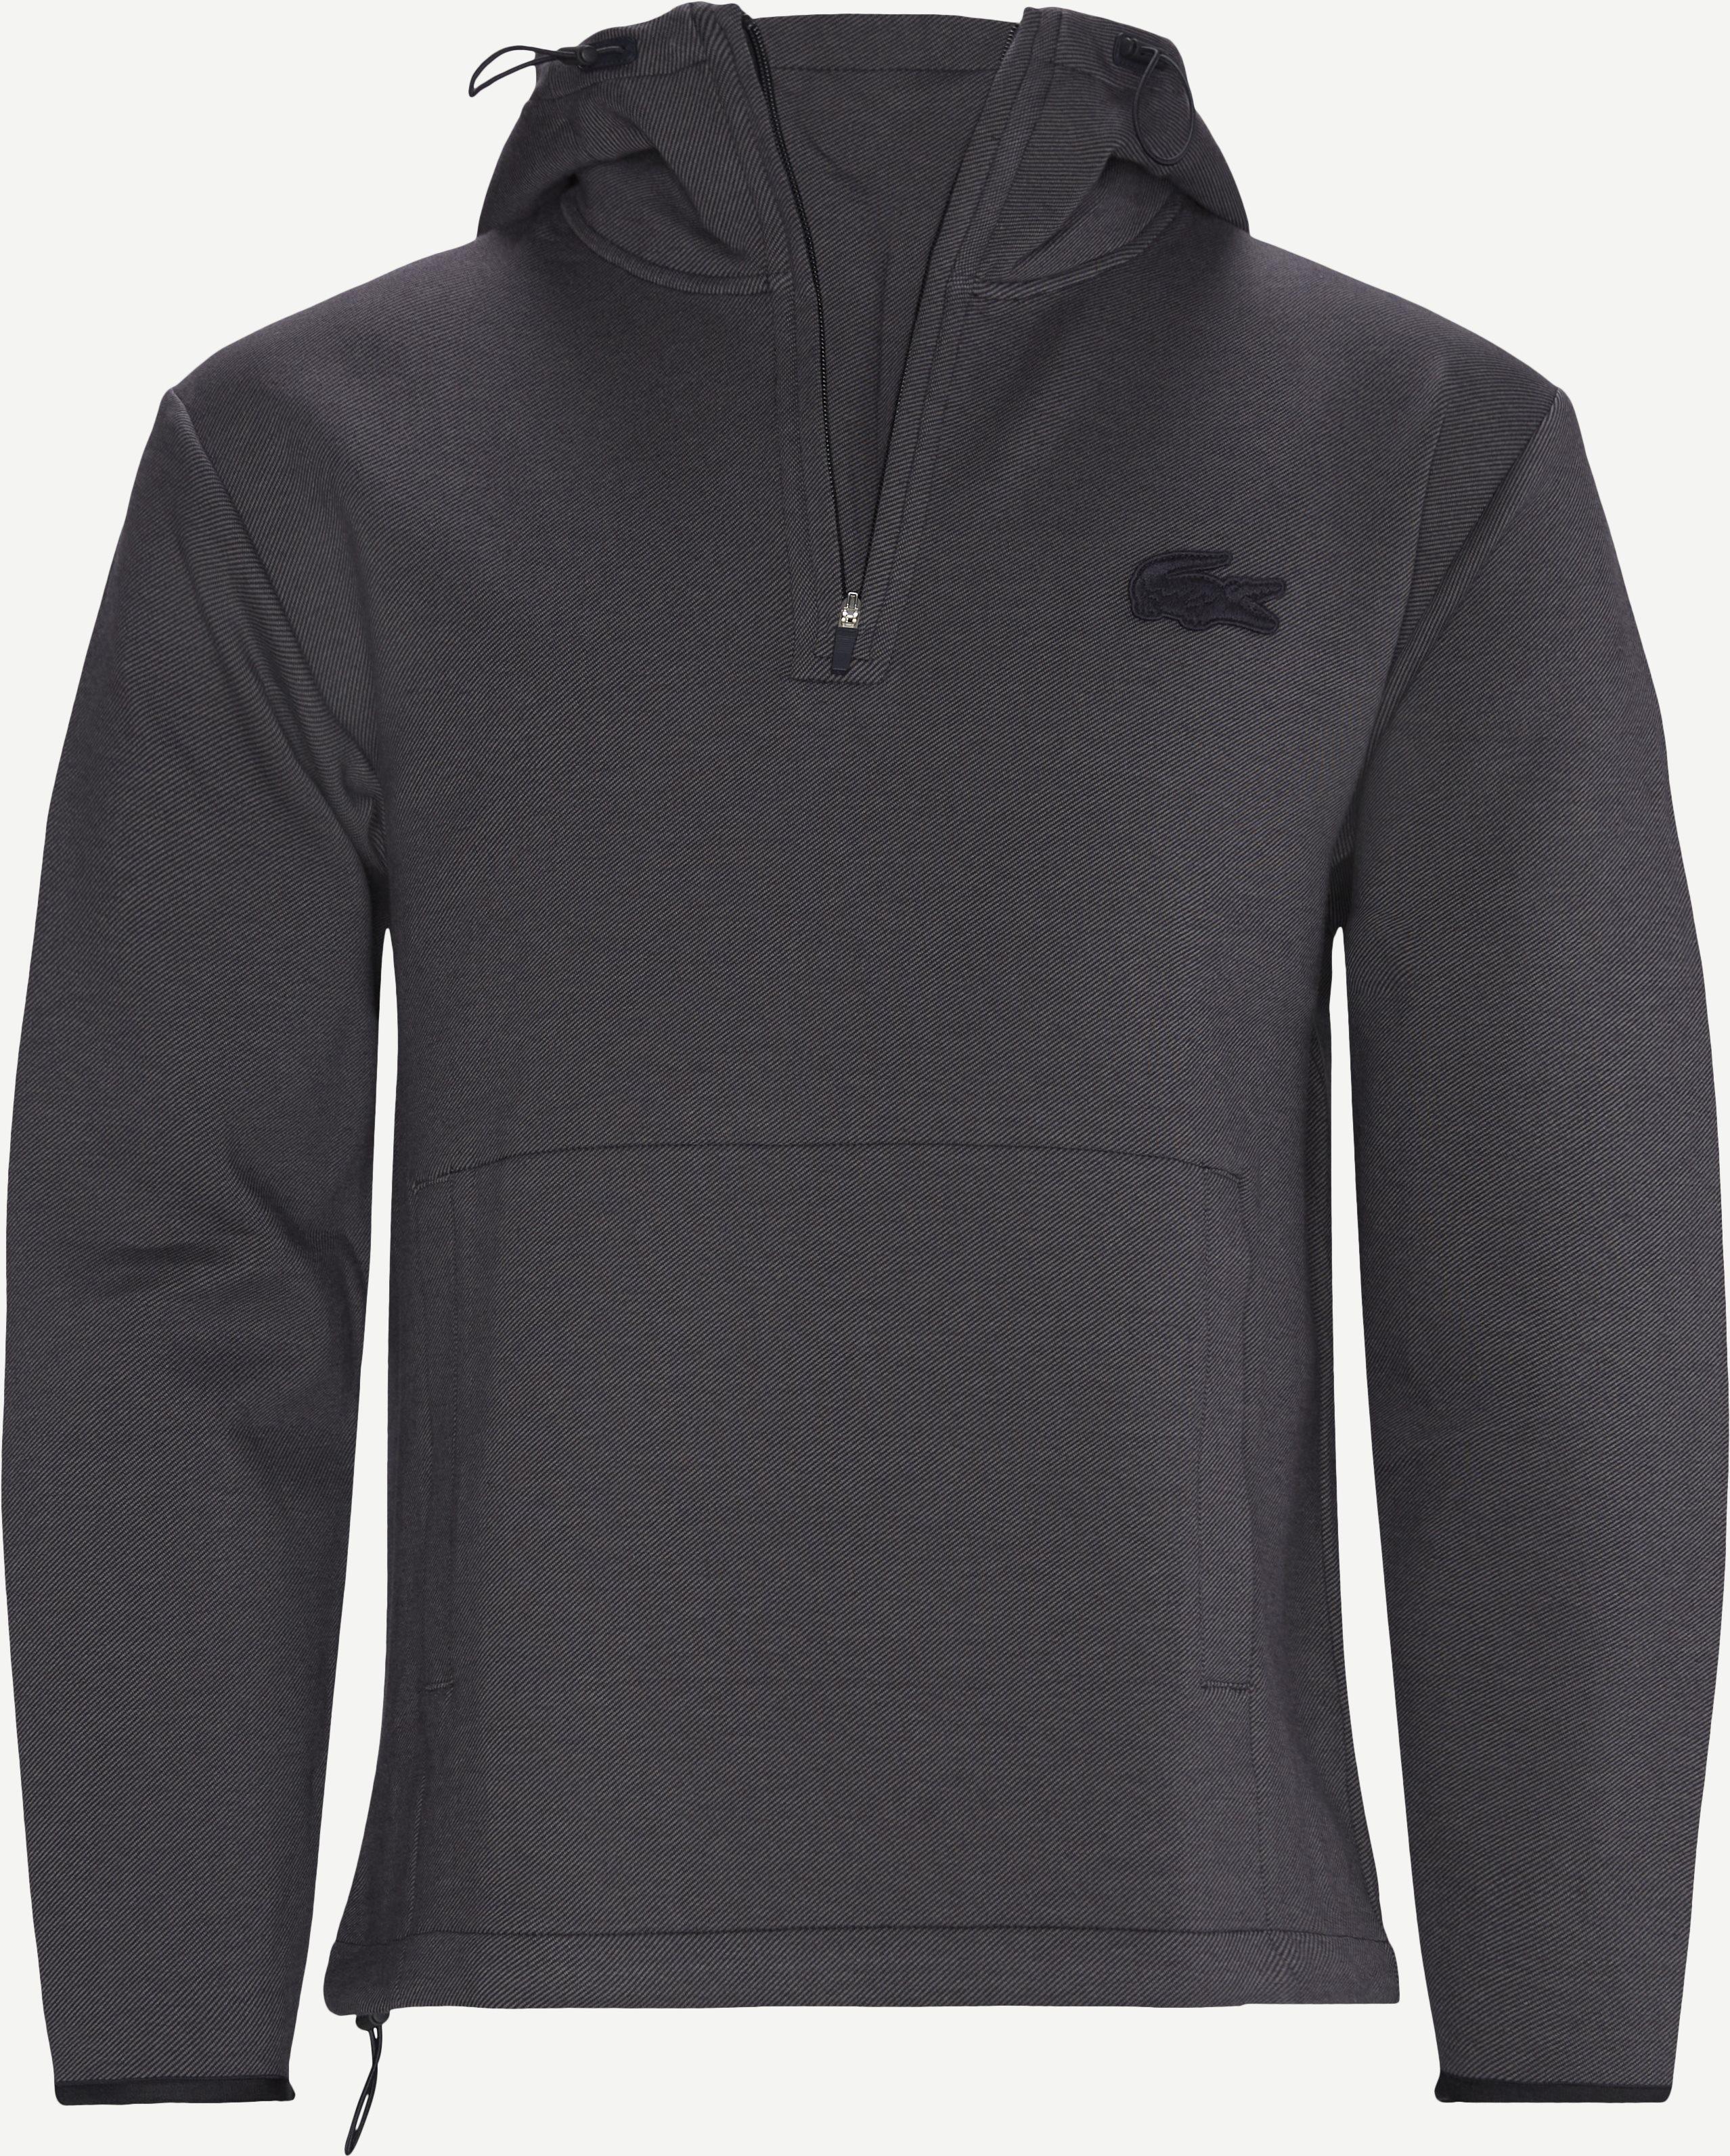 Hooded Cotton Blend Sweatshirt - Sweatshirts - Regular - Blue